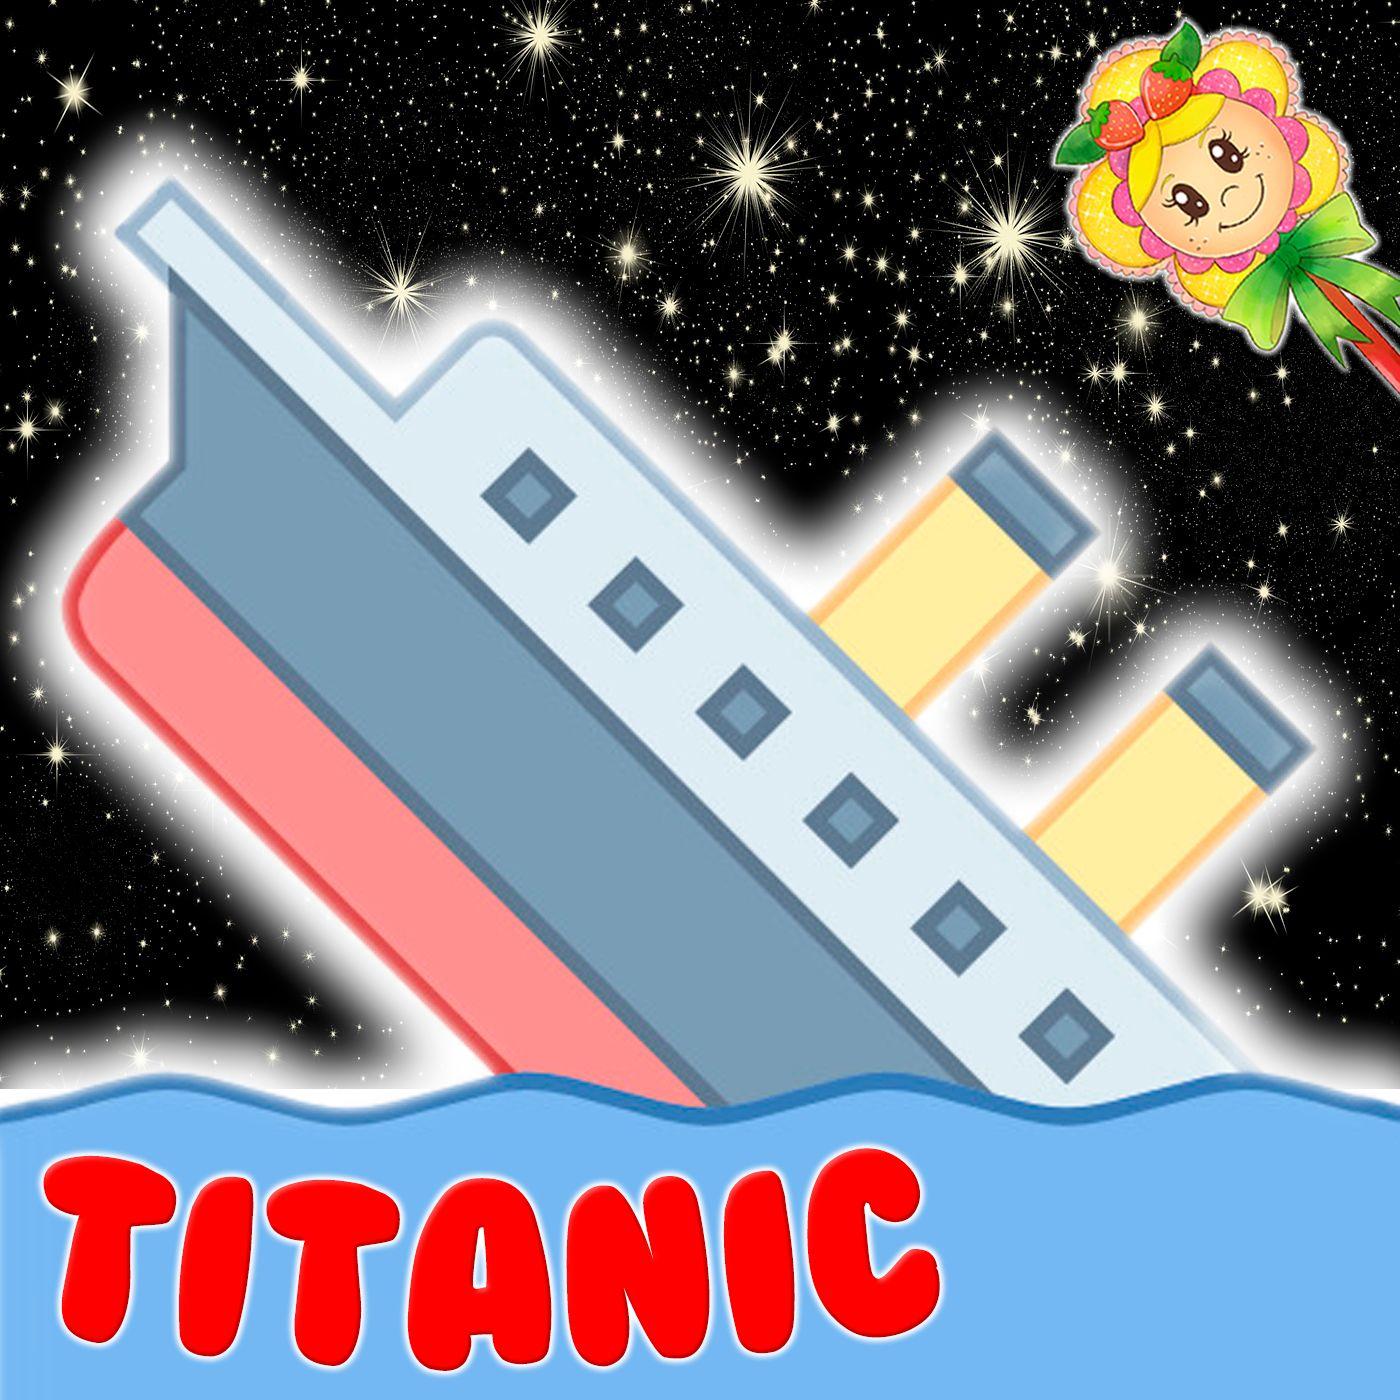 122. Titanic. Cuento infantil de Hada de Fresa sobre el famoso barco, pero con un original final